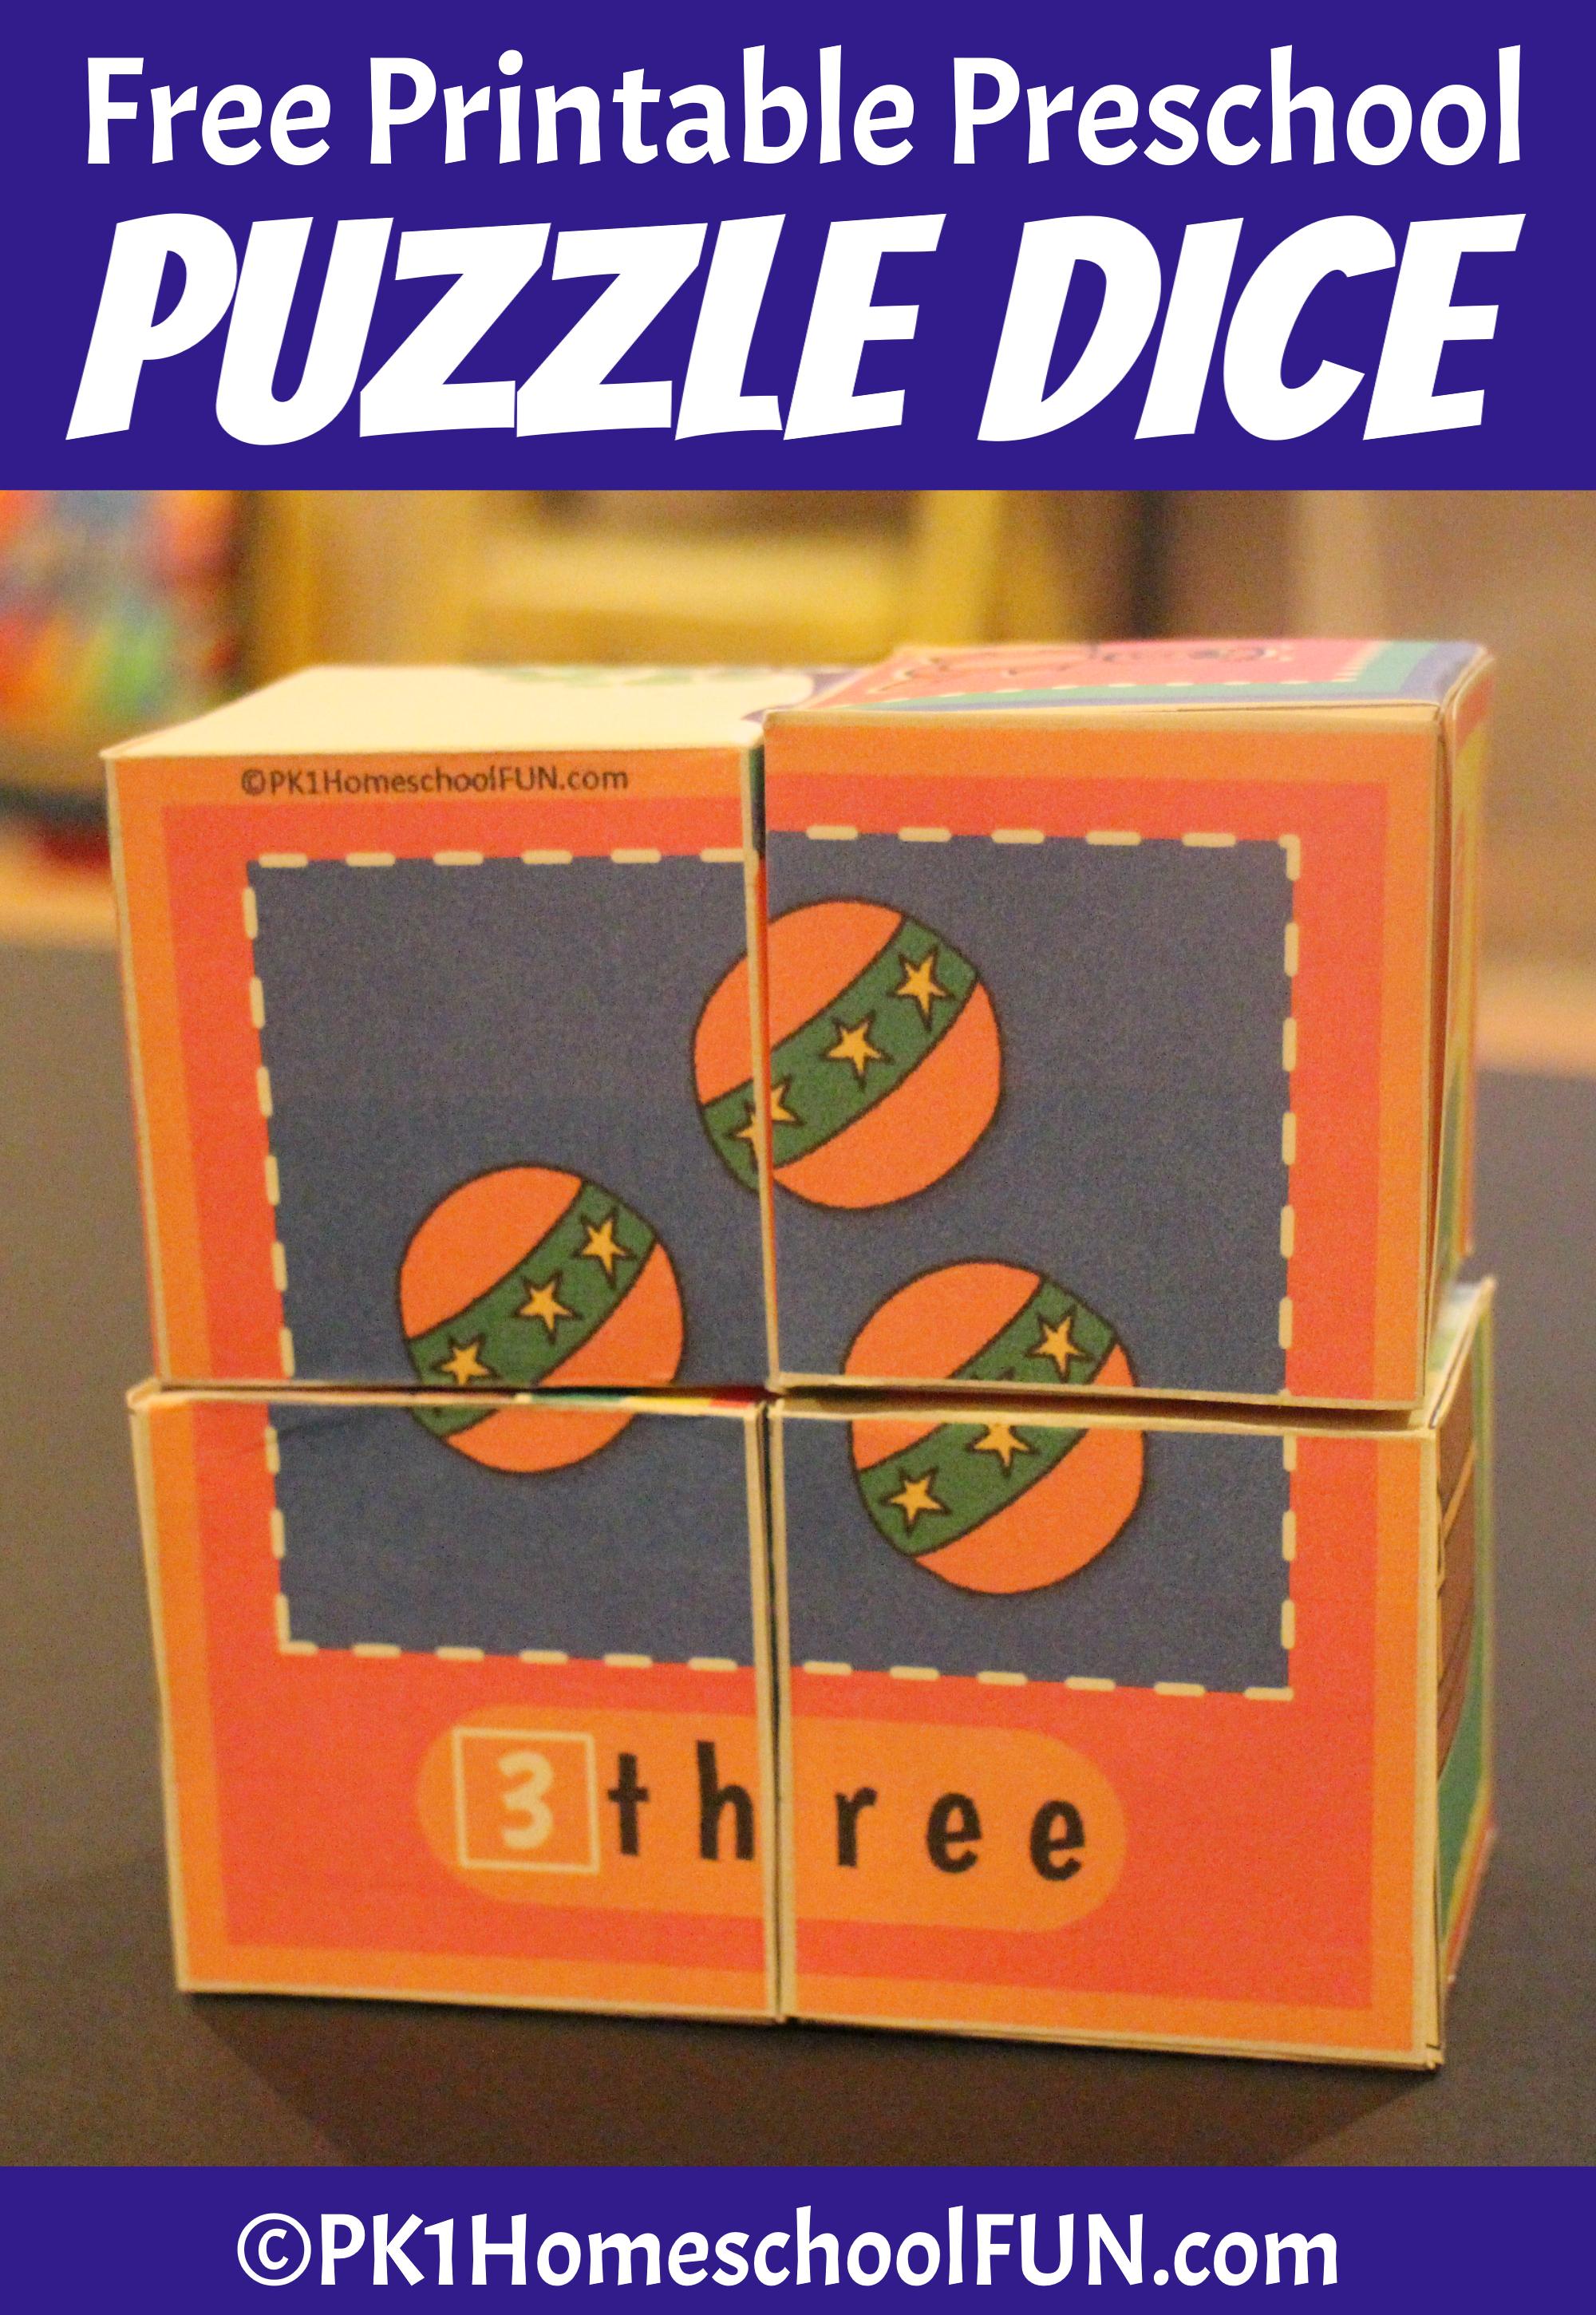 Free Printable Puzzle Dice For Preschoolers - Pk1Homeschoolfun - Printable Puzzles Preschool